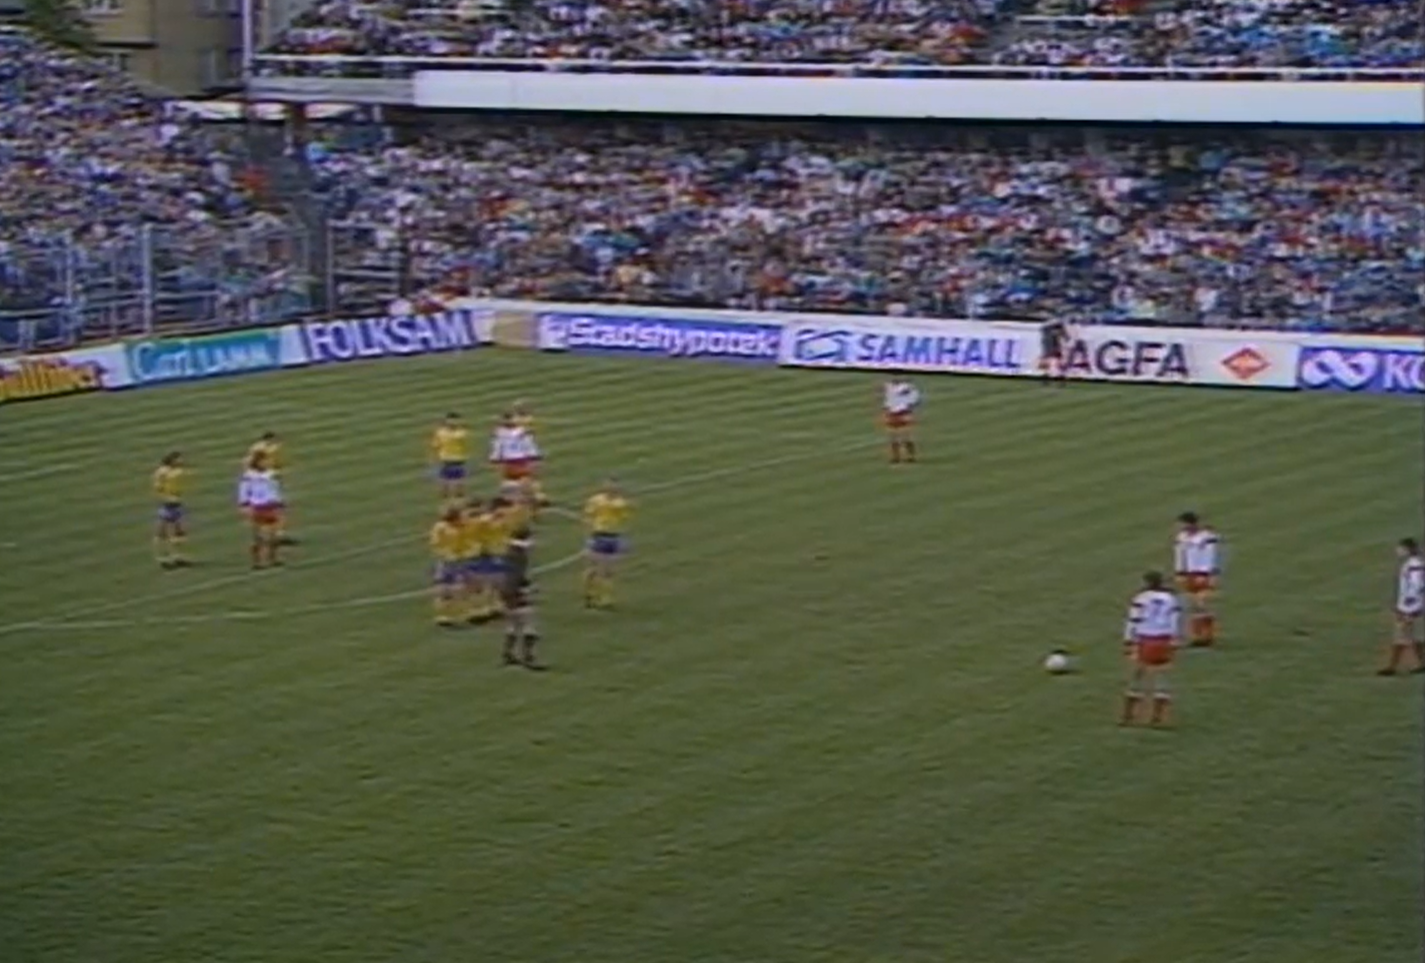 Szwecja-Polska 7 maja 1989